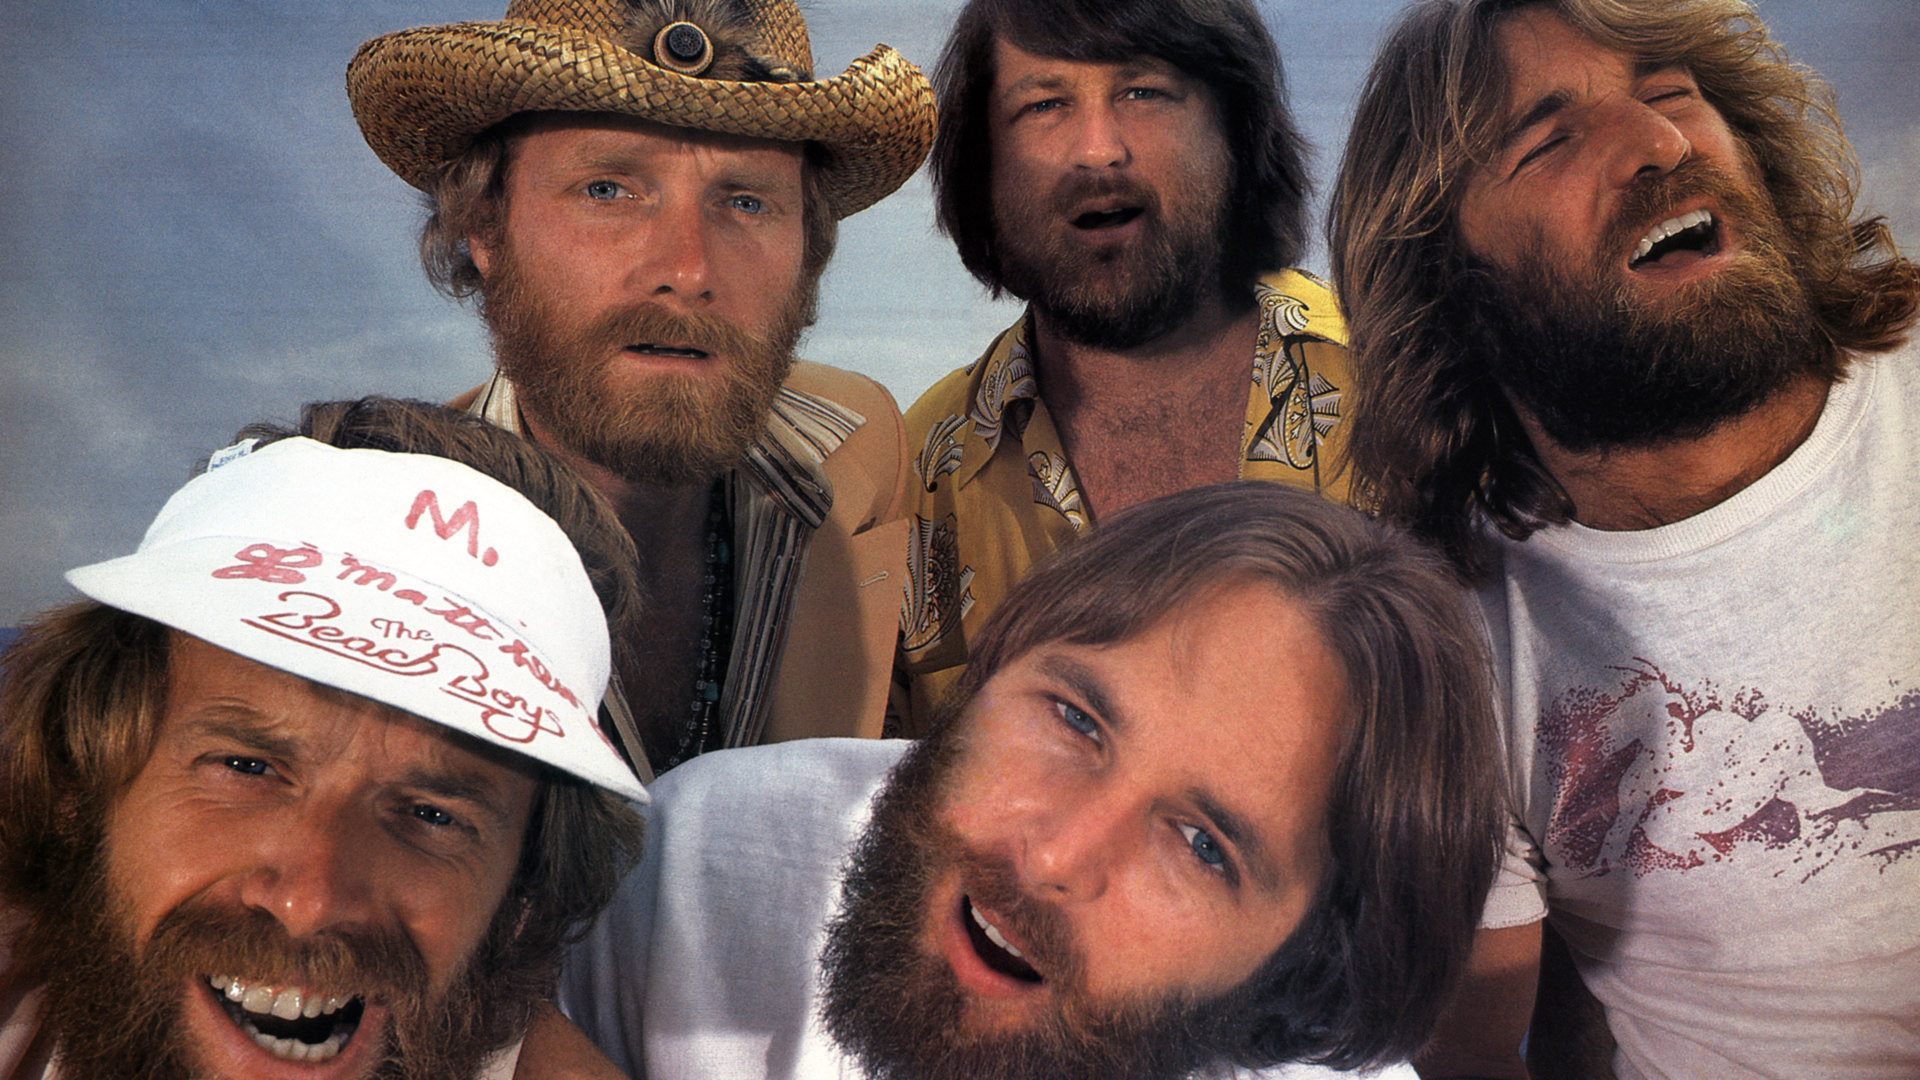 The Beach Boys HD Wallpaper Background Image 1920x1080 1920x1080